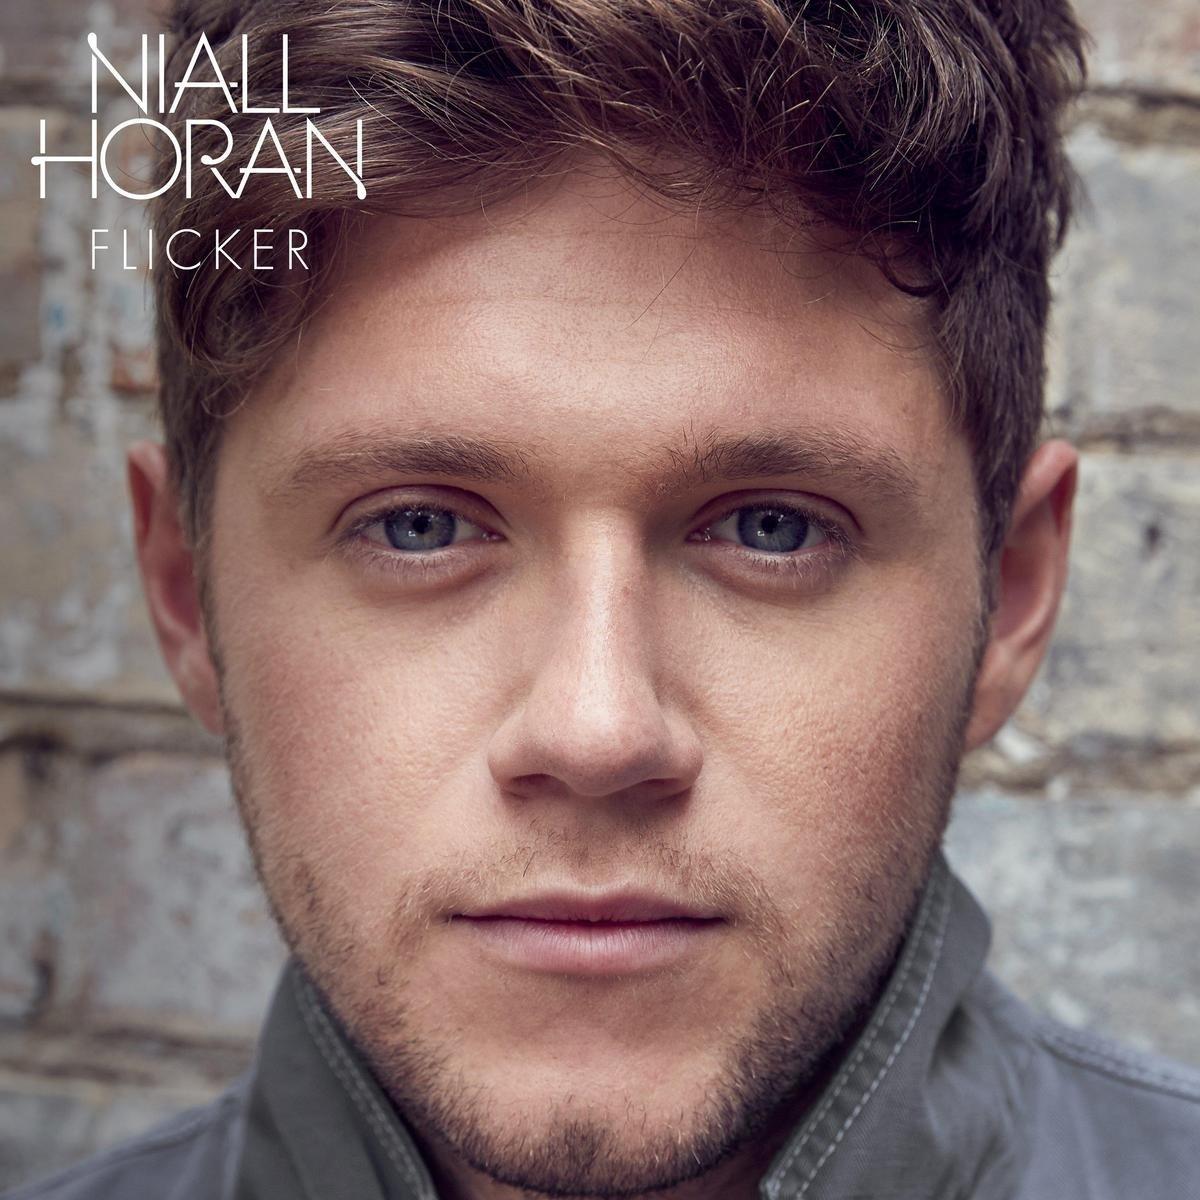 CD : Niall Horan - Flicker (Deluxe Edition)